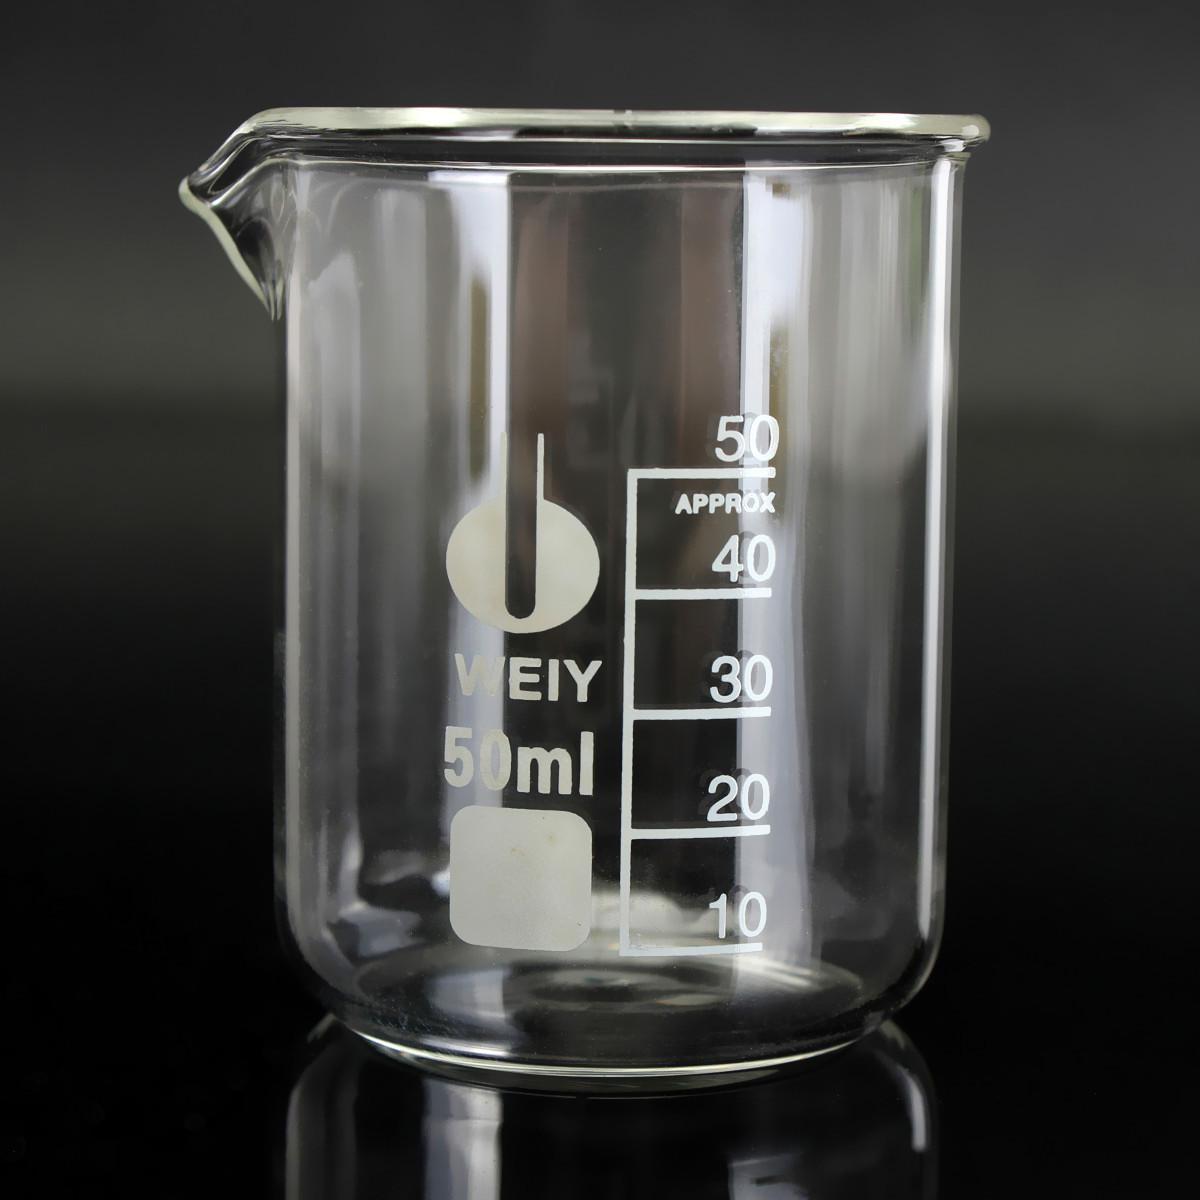 50ml Glass Beaker Borosilicate Chemistry Test Laboratory Chemical Measuring